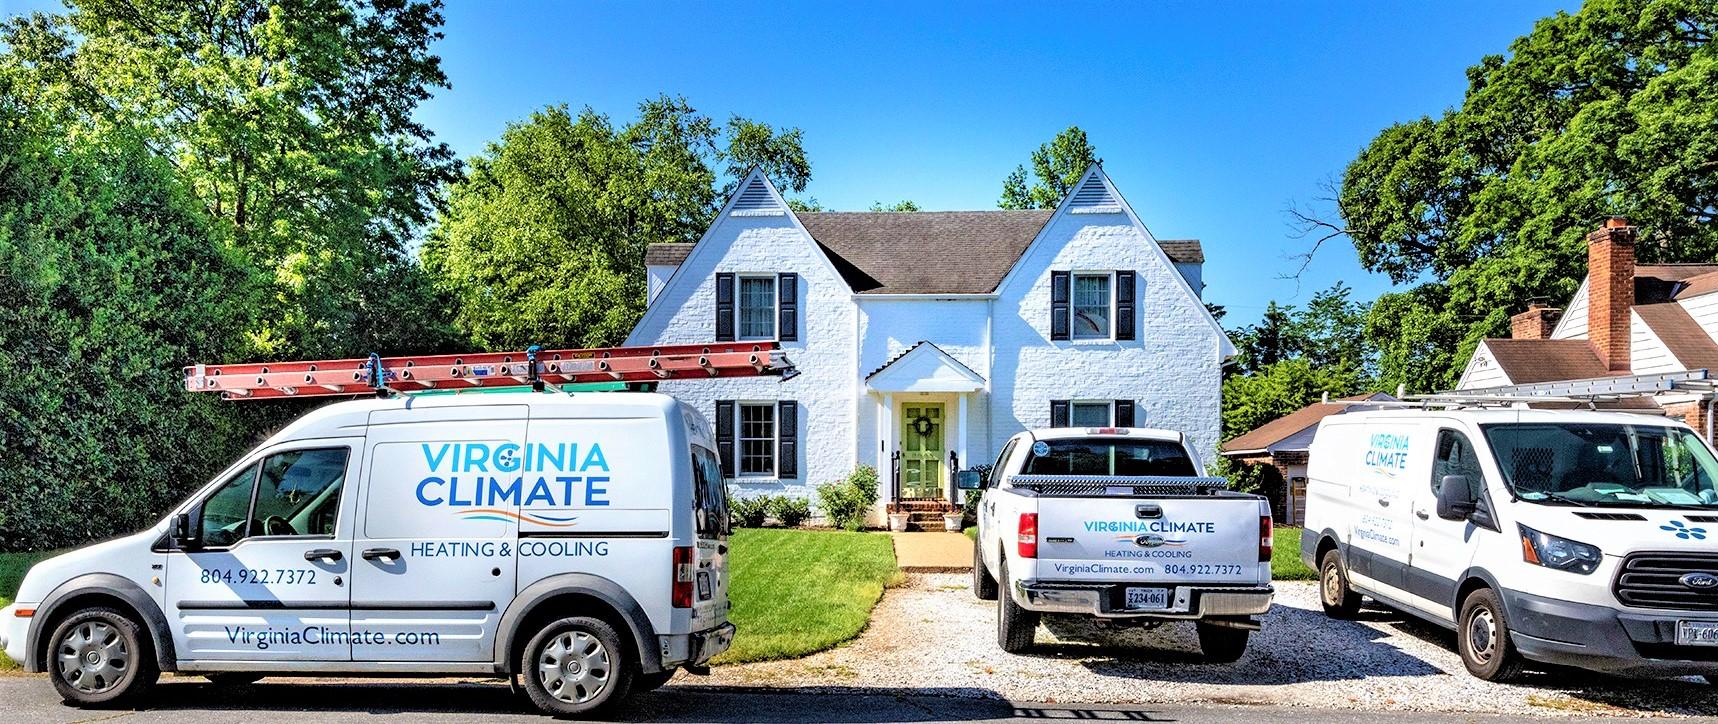 Virginia Climate Heating Van in front of home